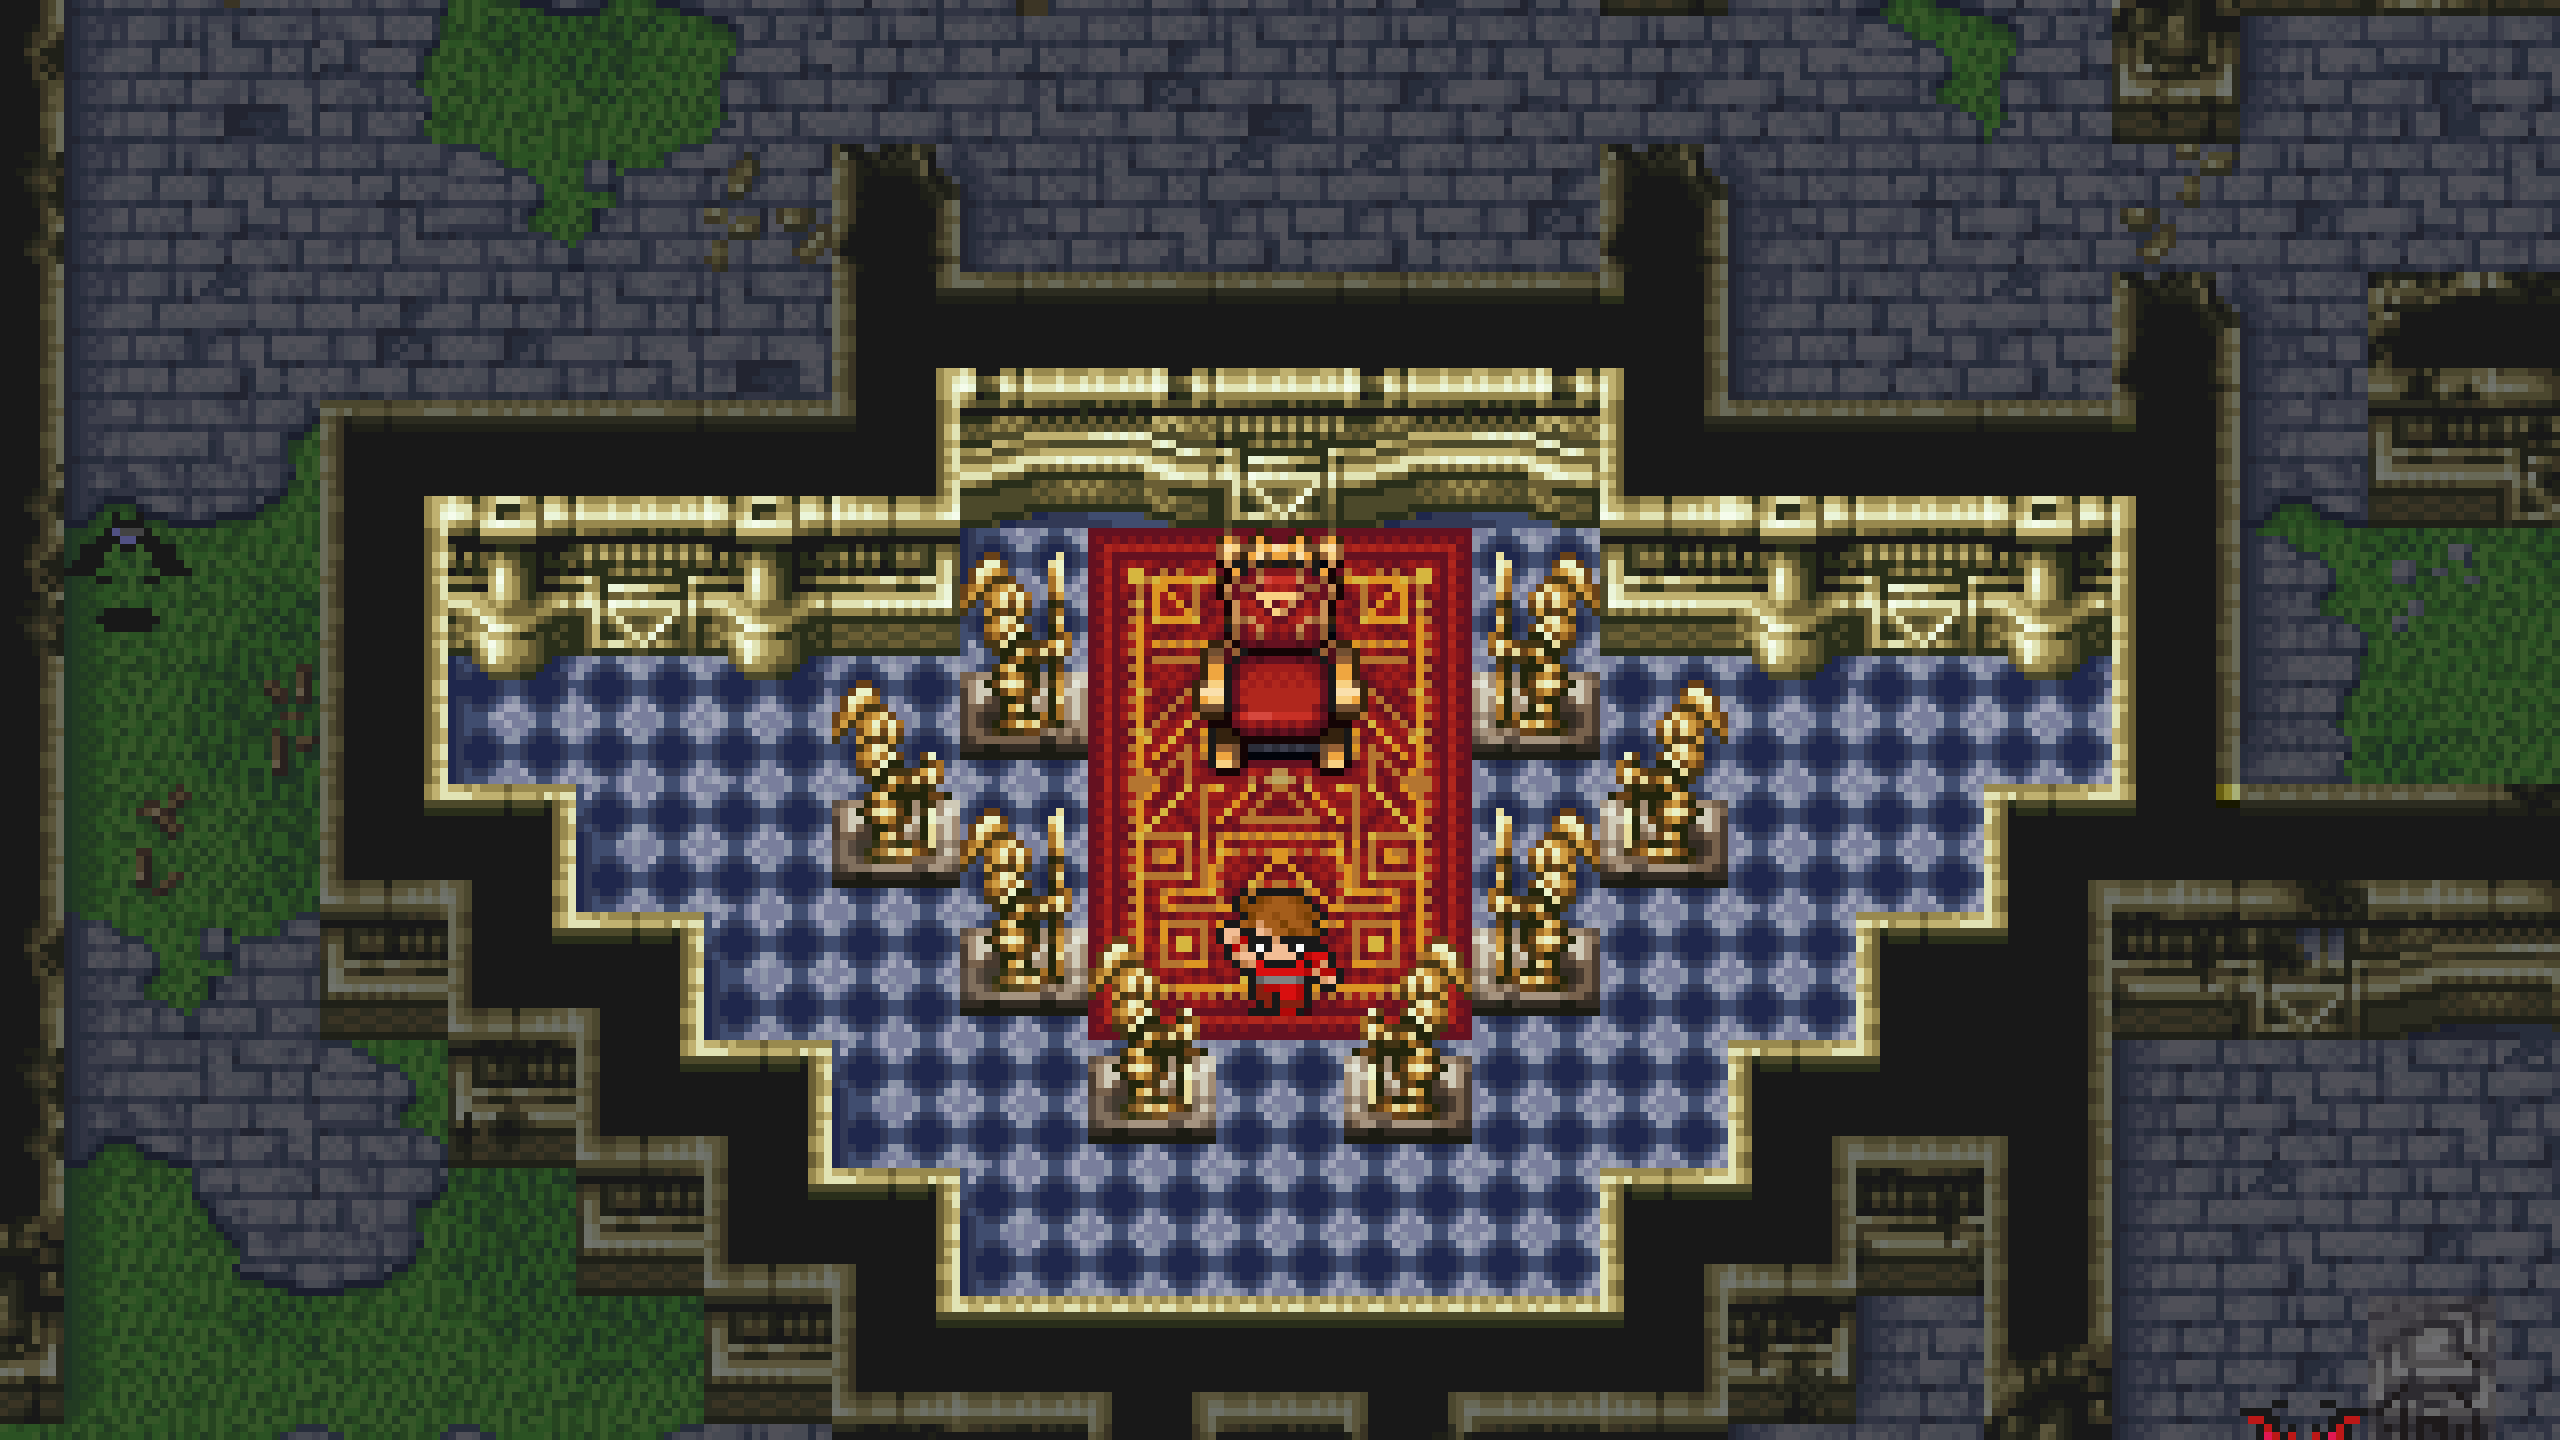 FINAL_FANTASY trone